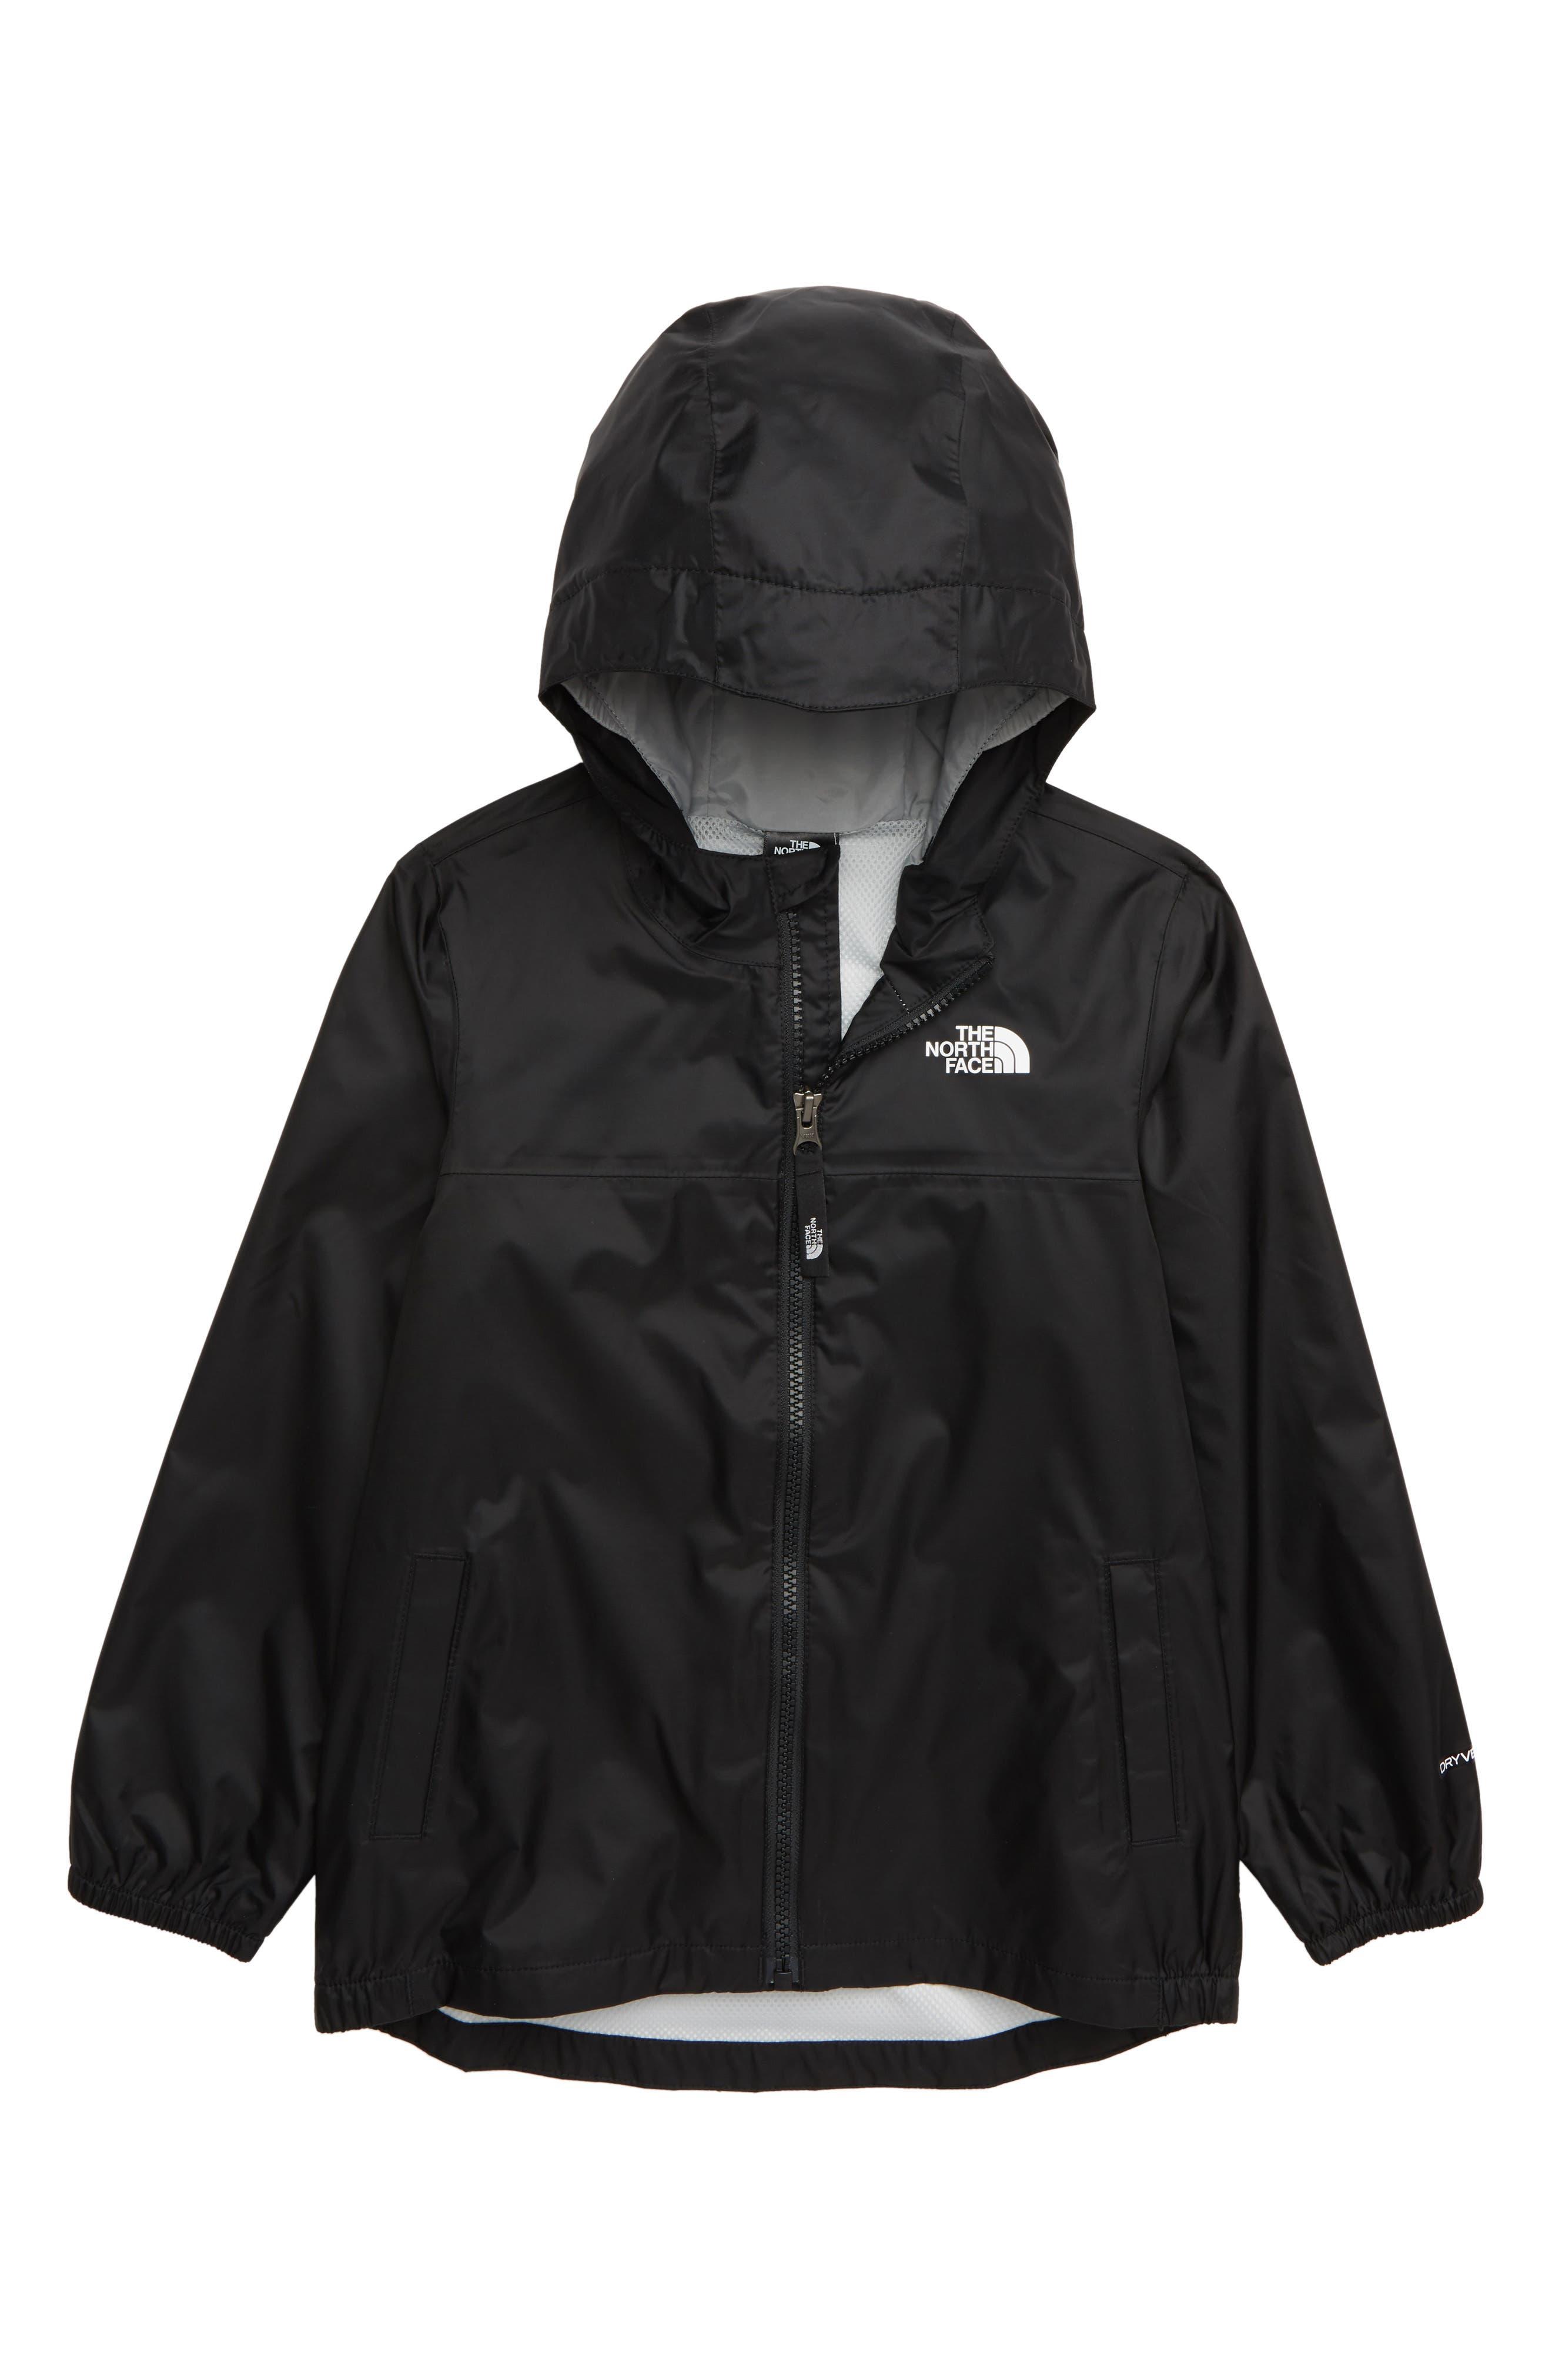 THE NORTH FACE, Zipline Hooded Rain Jacket, Main thumbnail 1, color, TNF BLACK